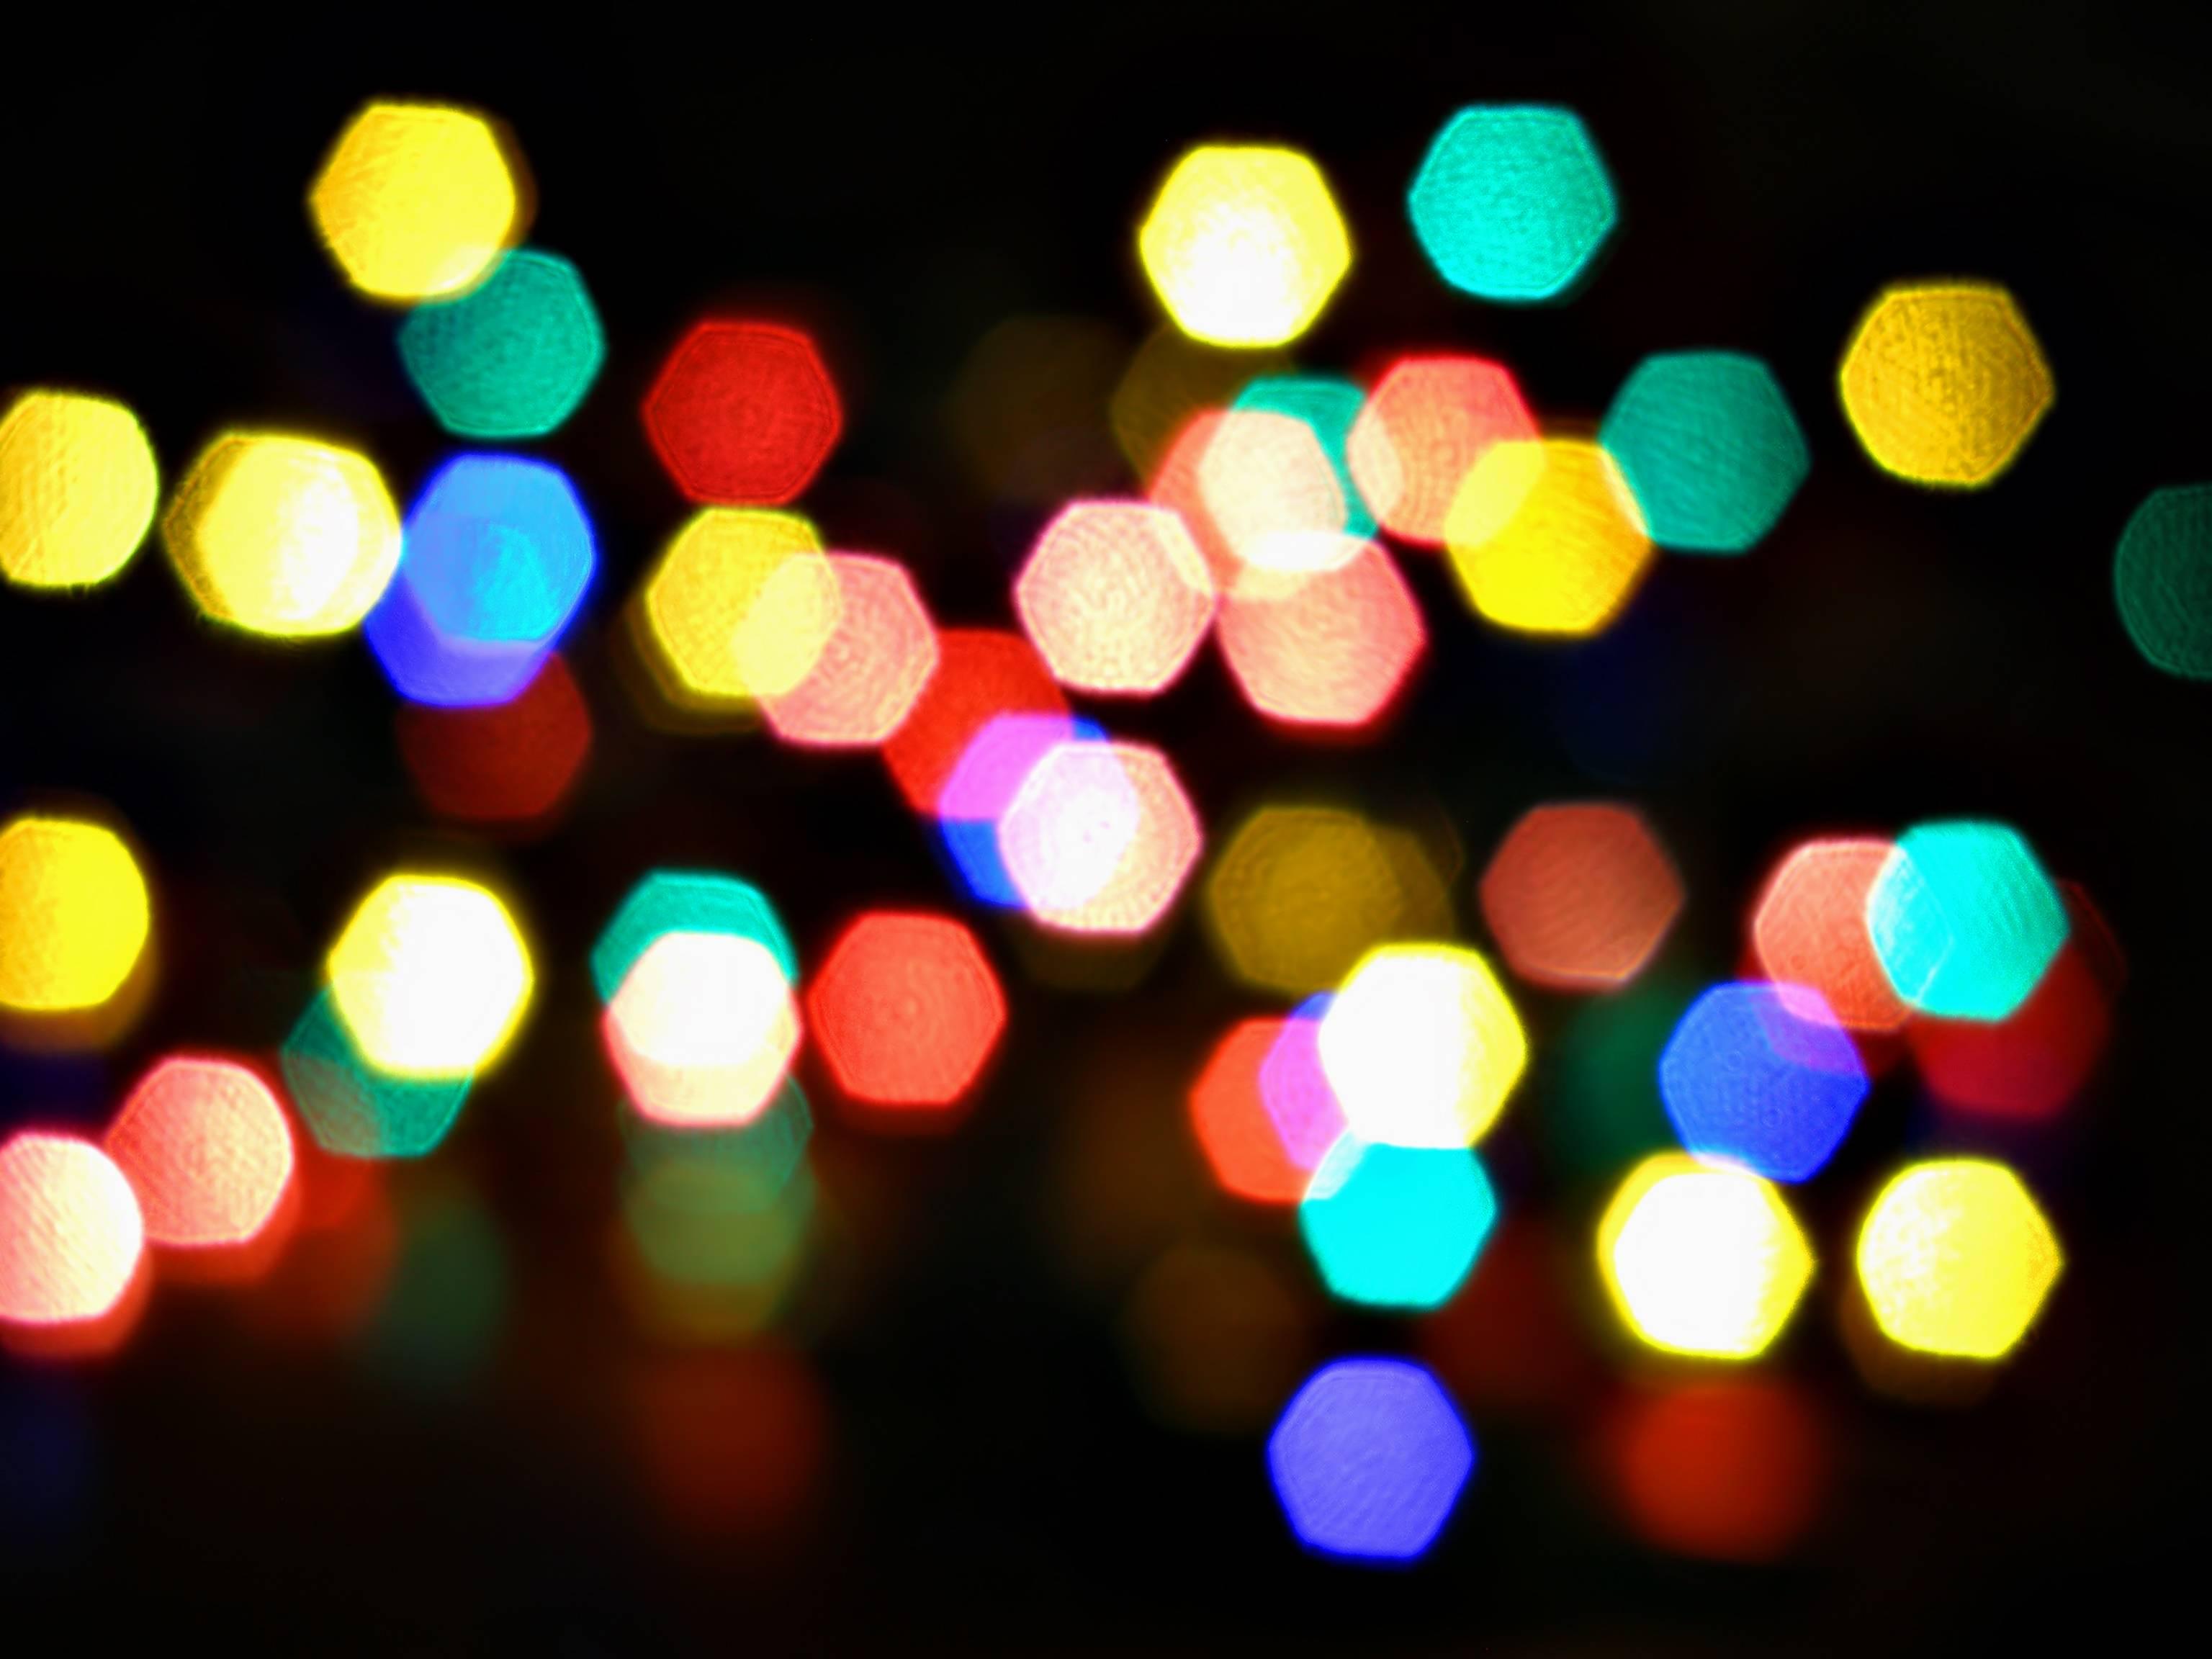 Christmas Light Backgrounds - Wallpaper Cave